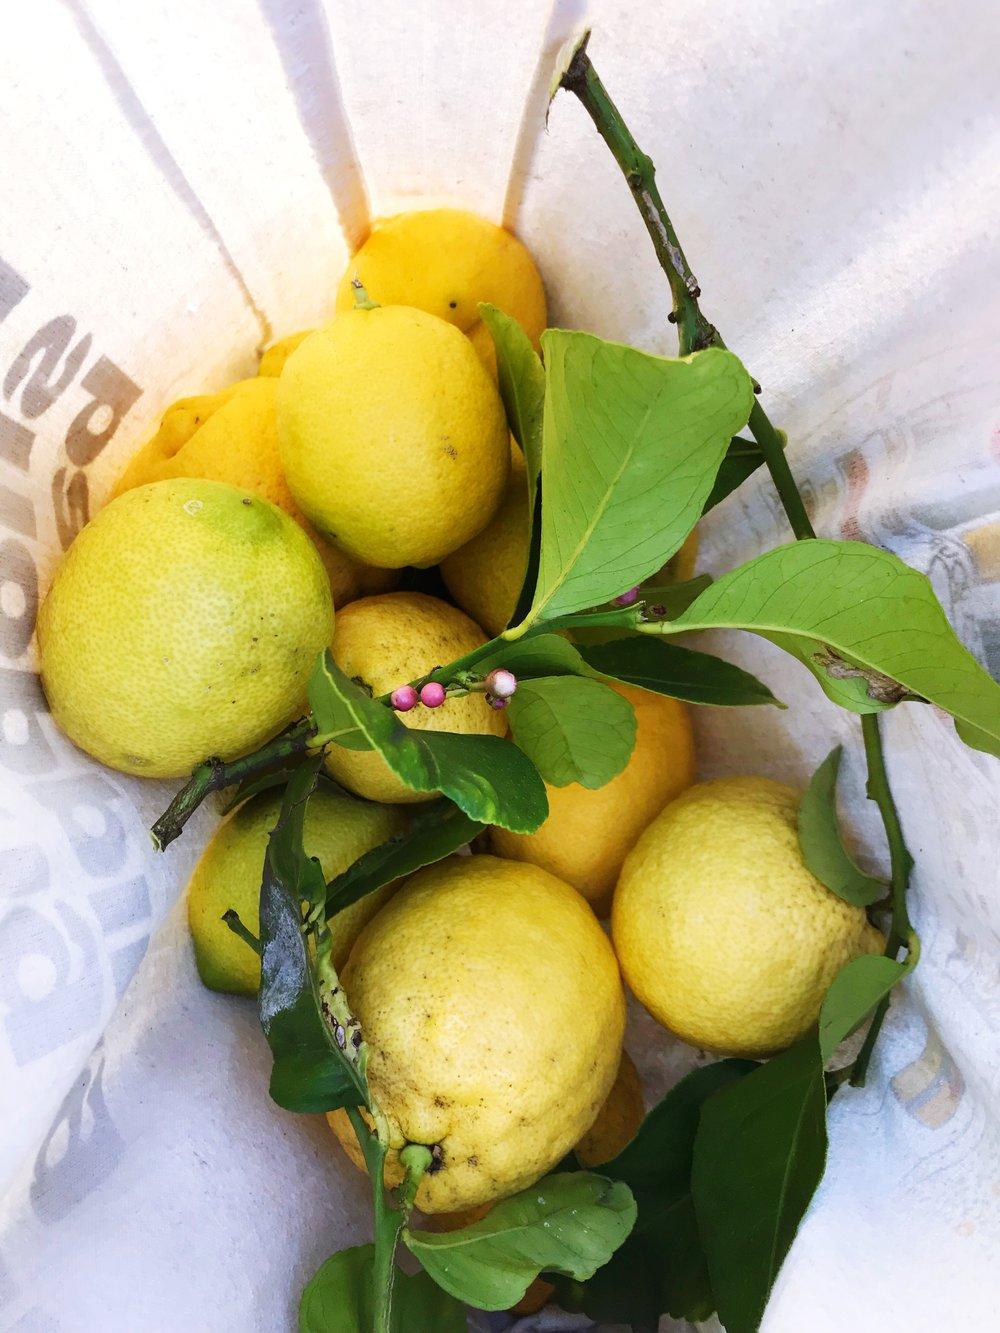 Lemon_Haul.JPG